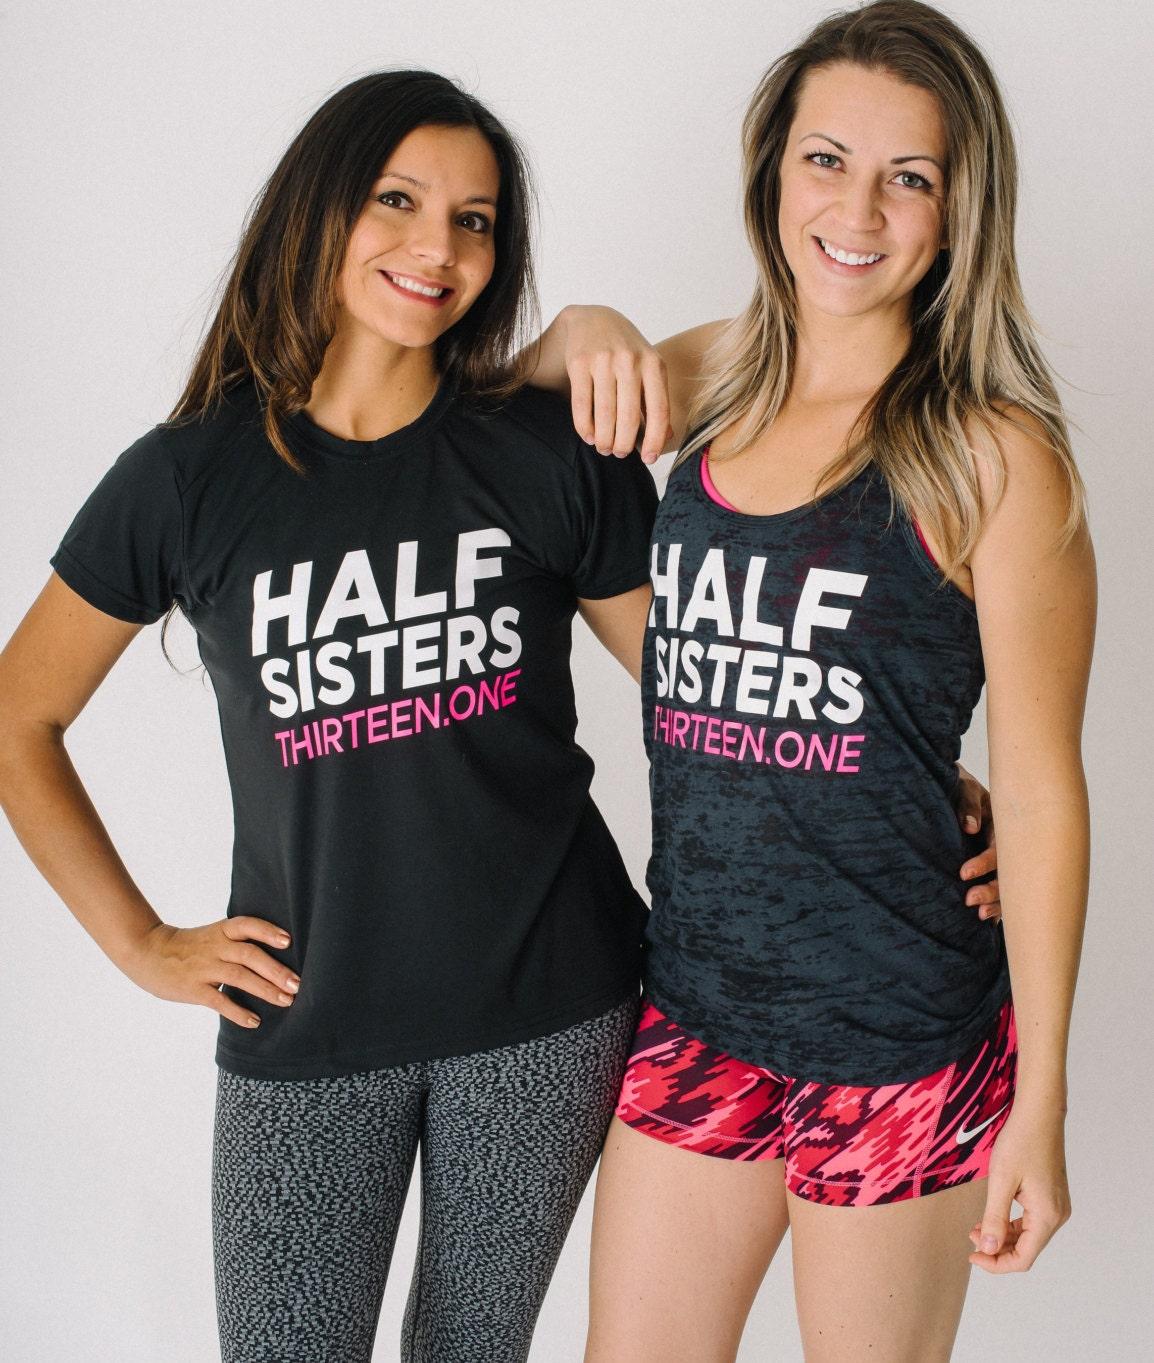 Half Sisters 2 Shirt Bundle Thirteenone Marathon Etsy Tendencies Short Shirts Basic Long Collar Less White Putih M Gift Running Partner